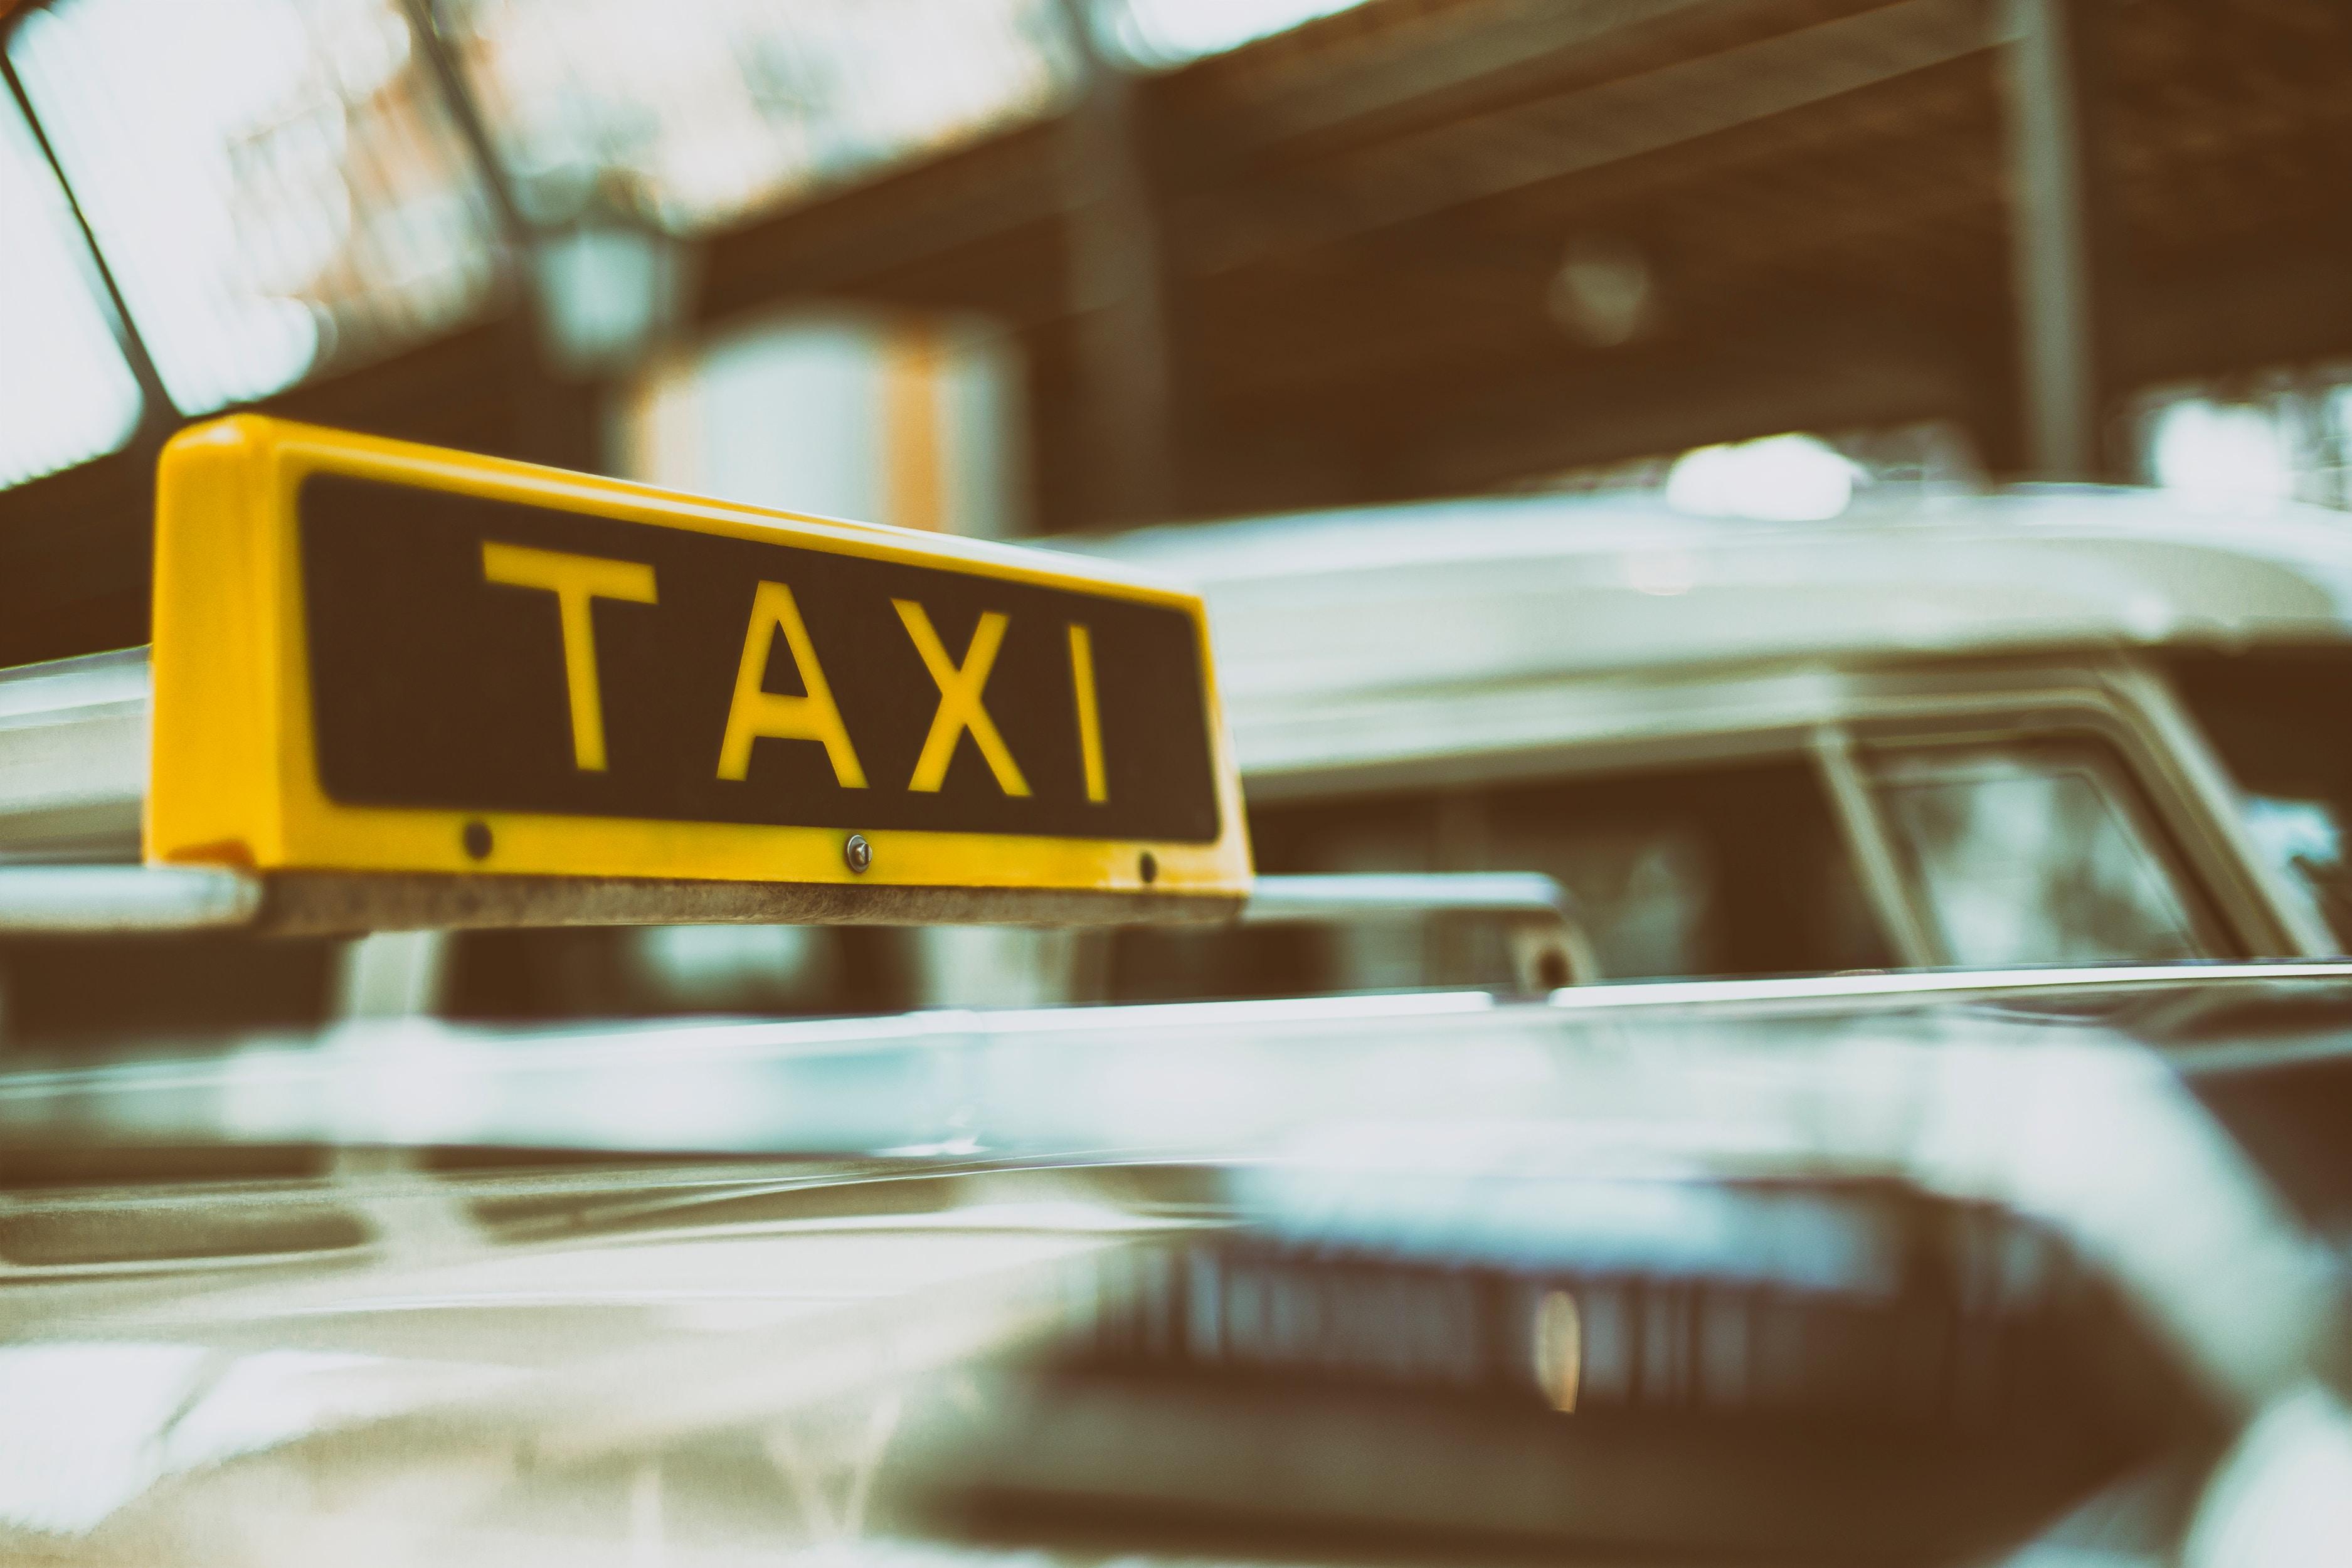 Vervoer taxi - vlucht naar Toscane